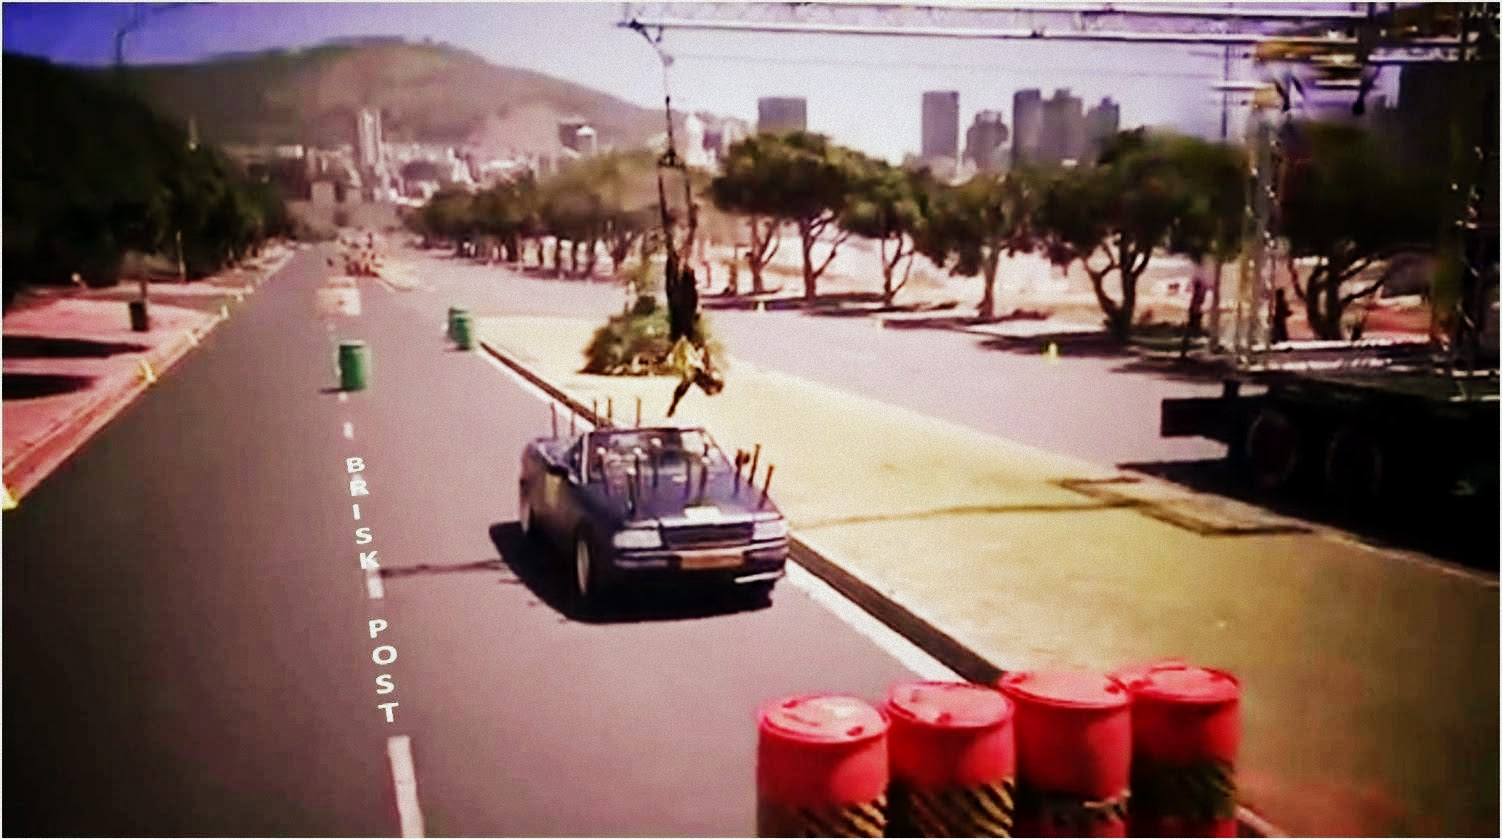 Khatron Ke Khiladi Car stunt with slow ride, hurdles, and flag collection